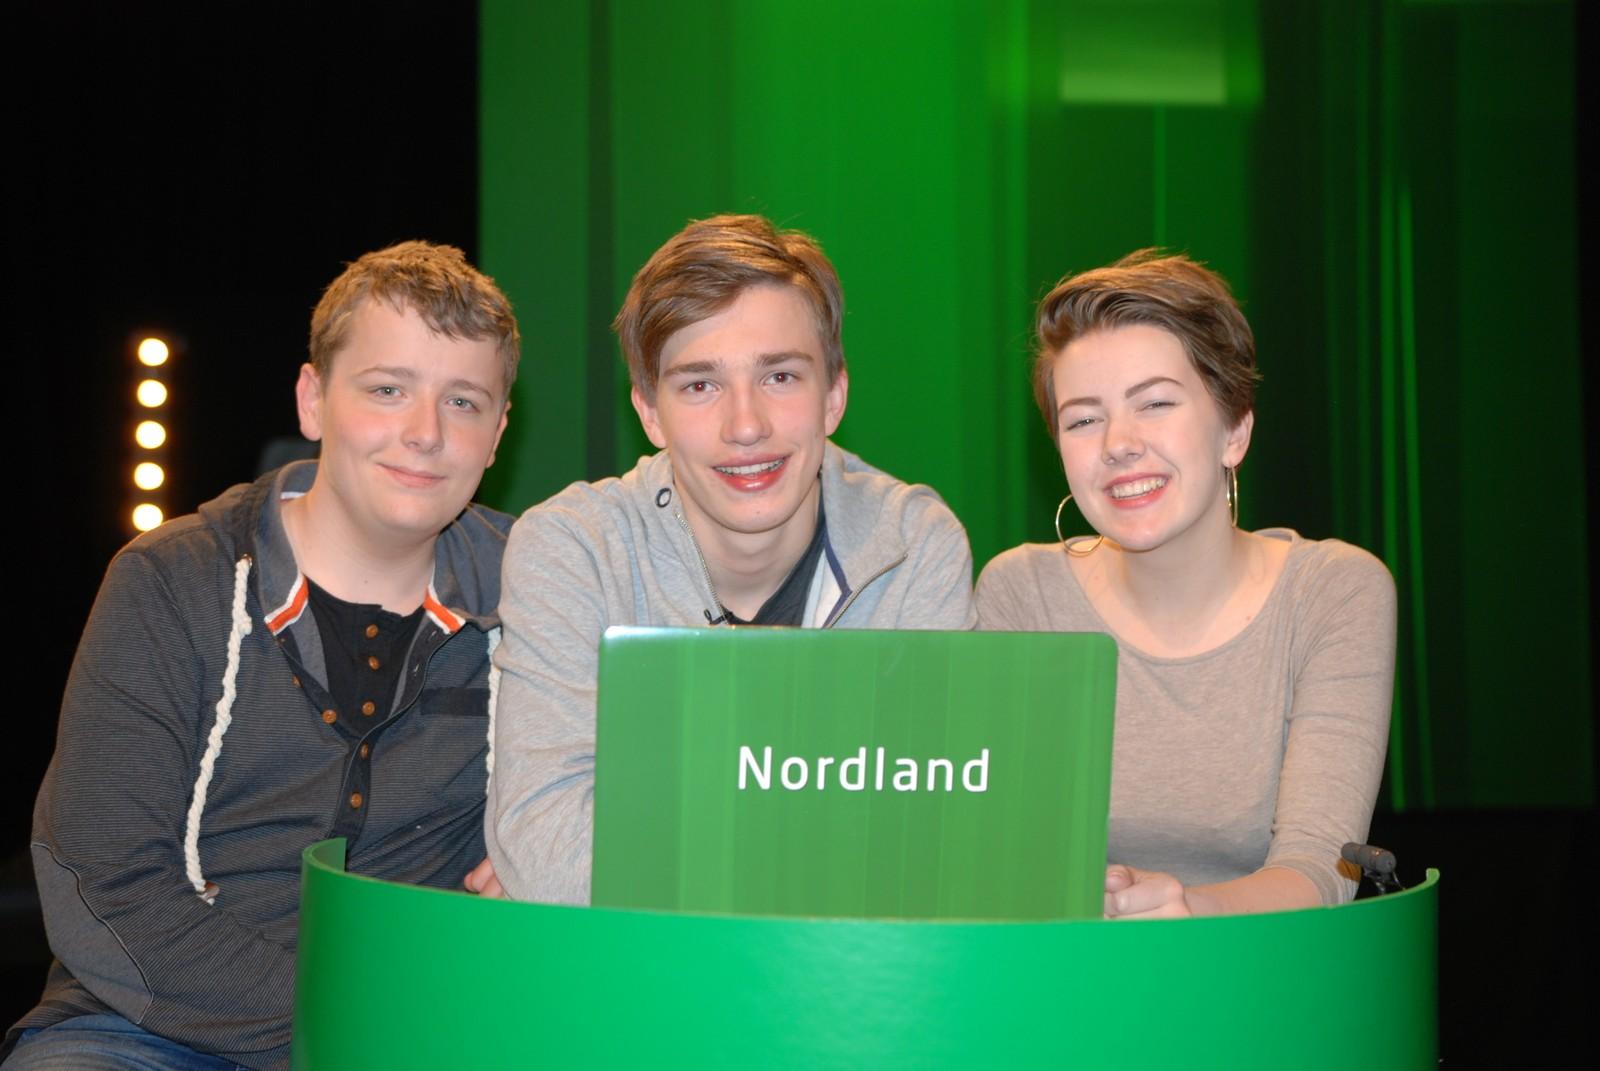 NORDLAND: Kippermoen ungdomsskole i Mosjøen representert ved Thea Maageng Nordås, Daniel Søfting Eilertsen og Elias Kolsvik Eide.